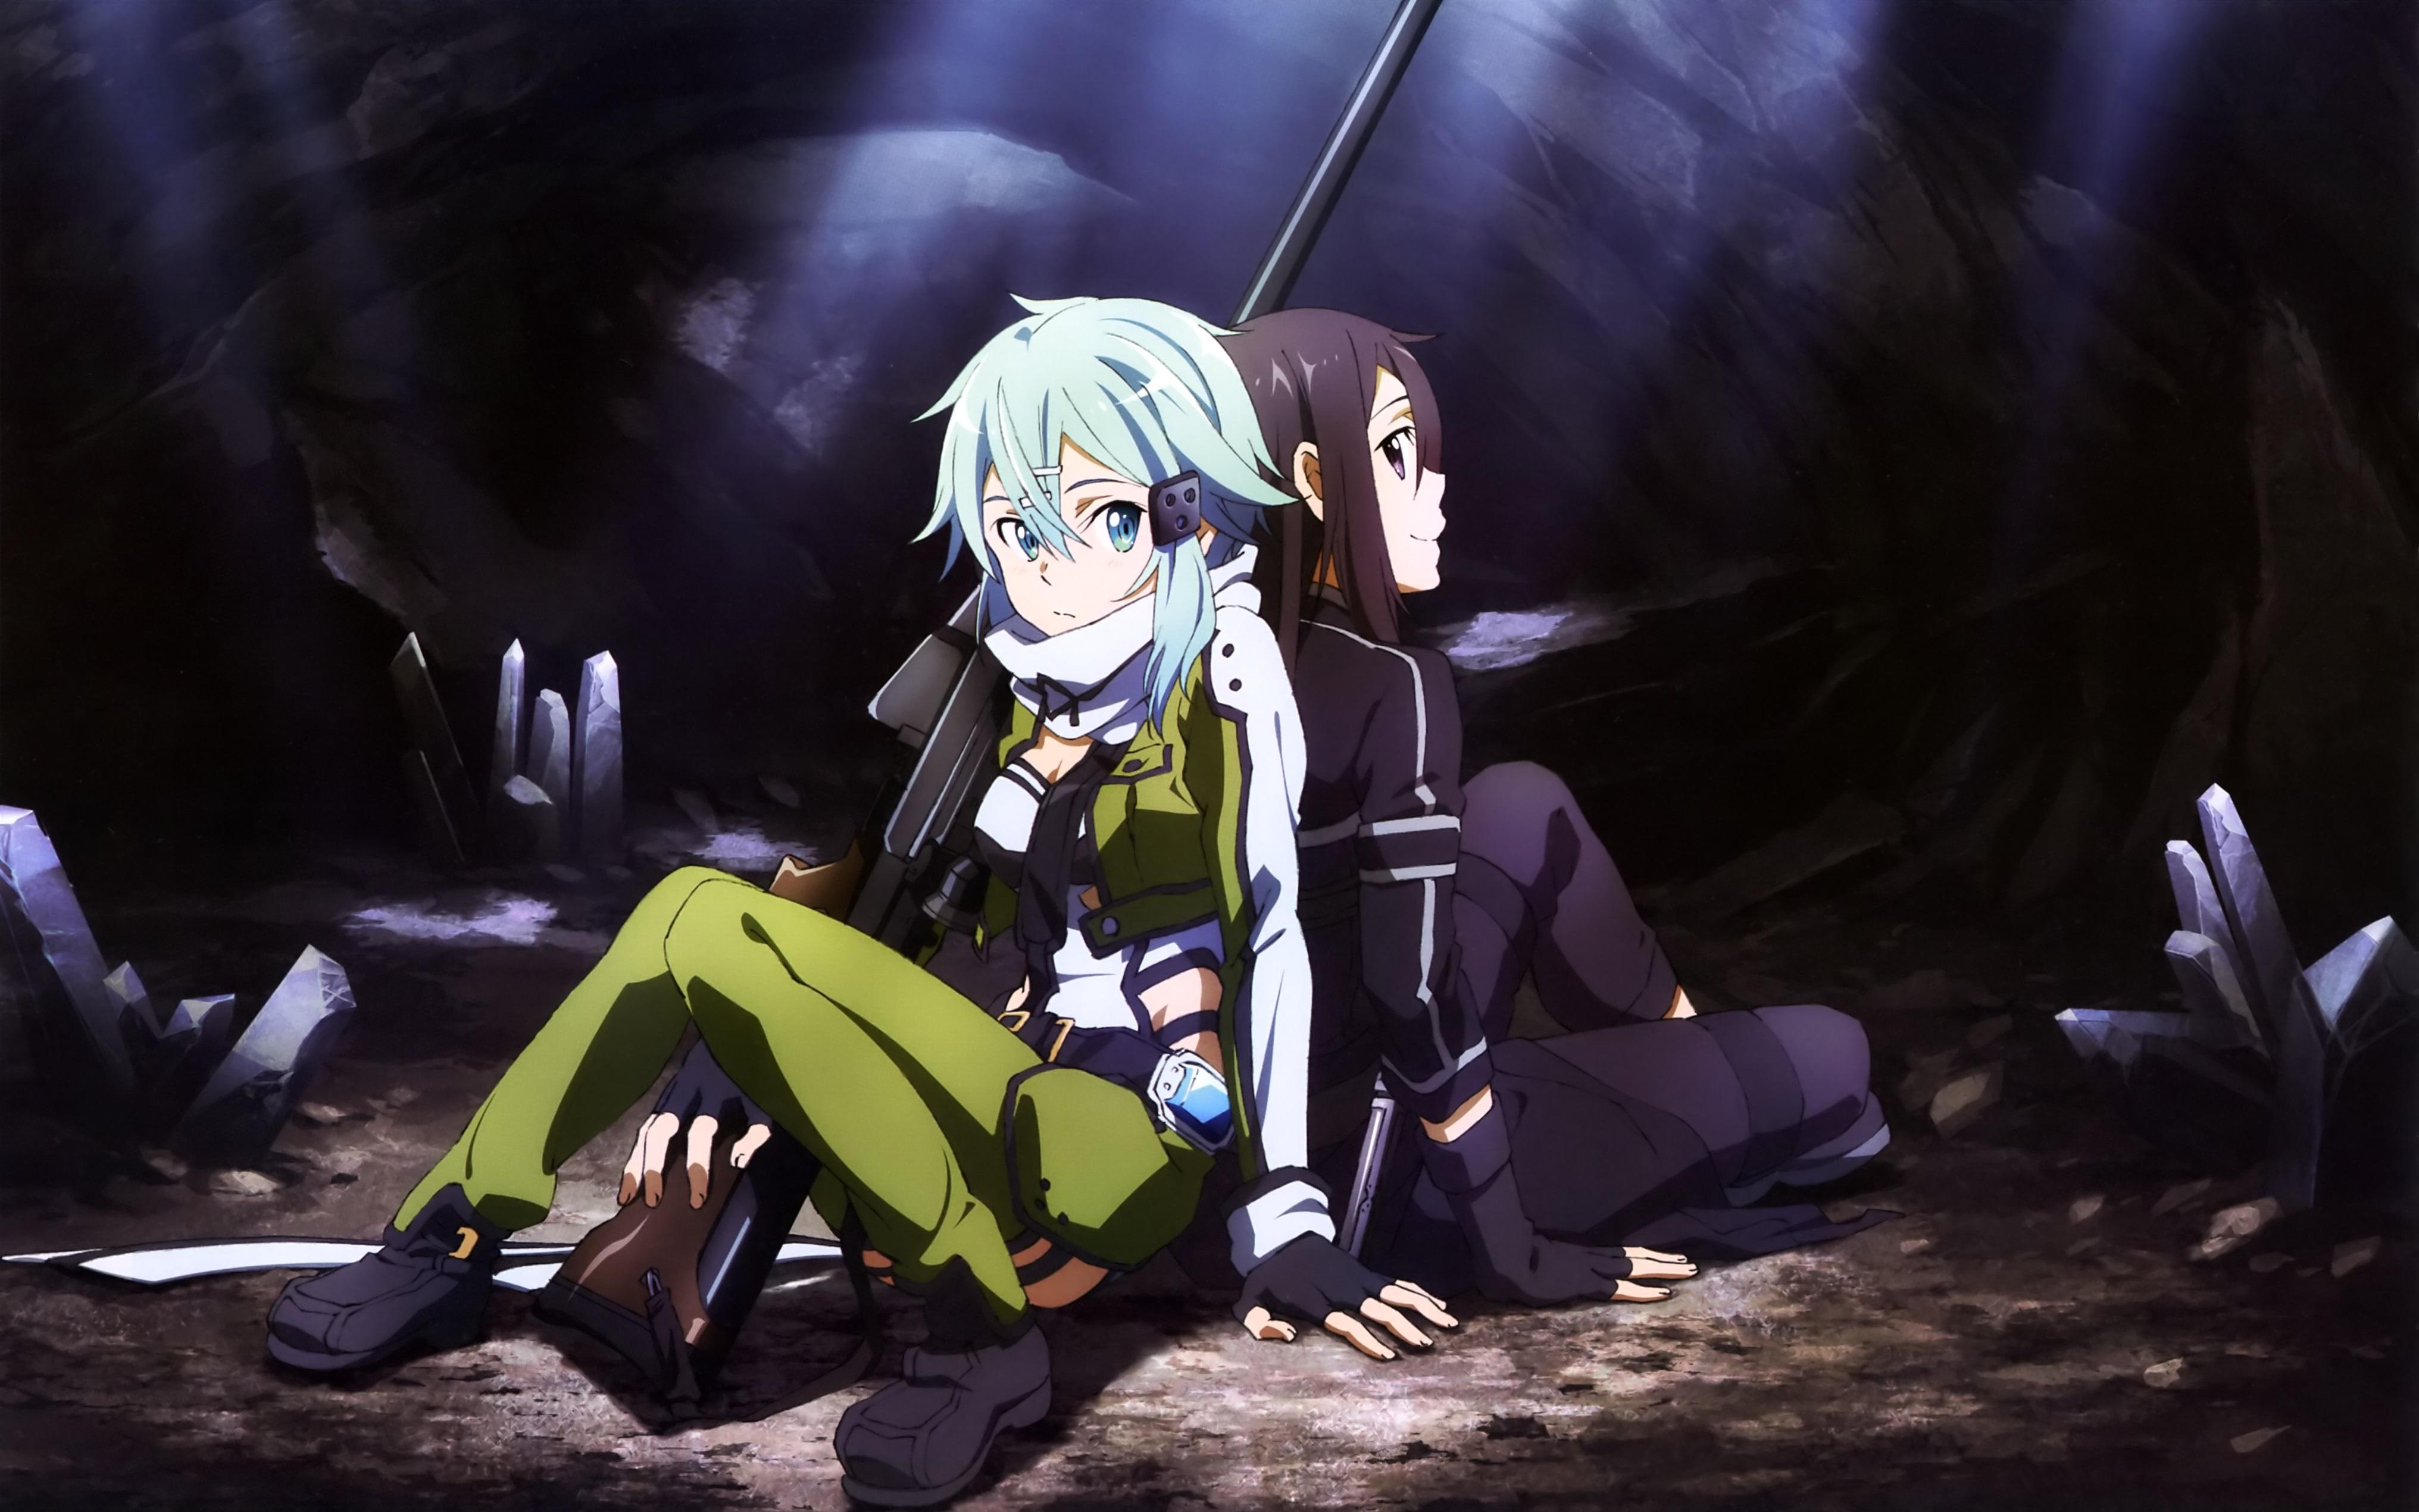 Download Wallpaper From Anime Sword Art Online Ii With - Sword Art Online Wallpaper Kirito And Sinon , HD Wallpaper & Backgrounds